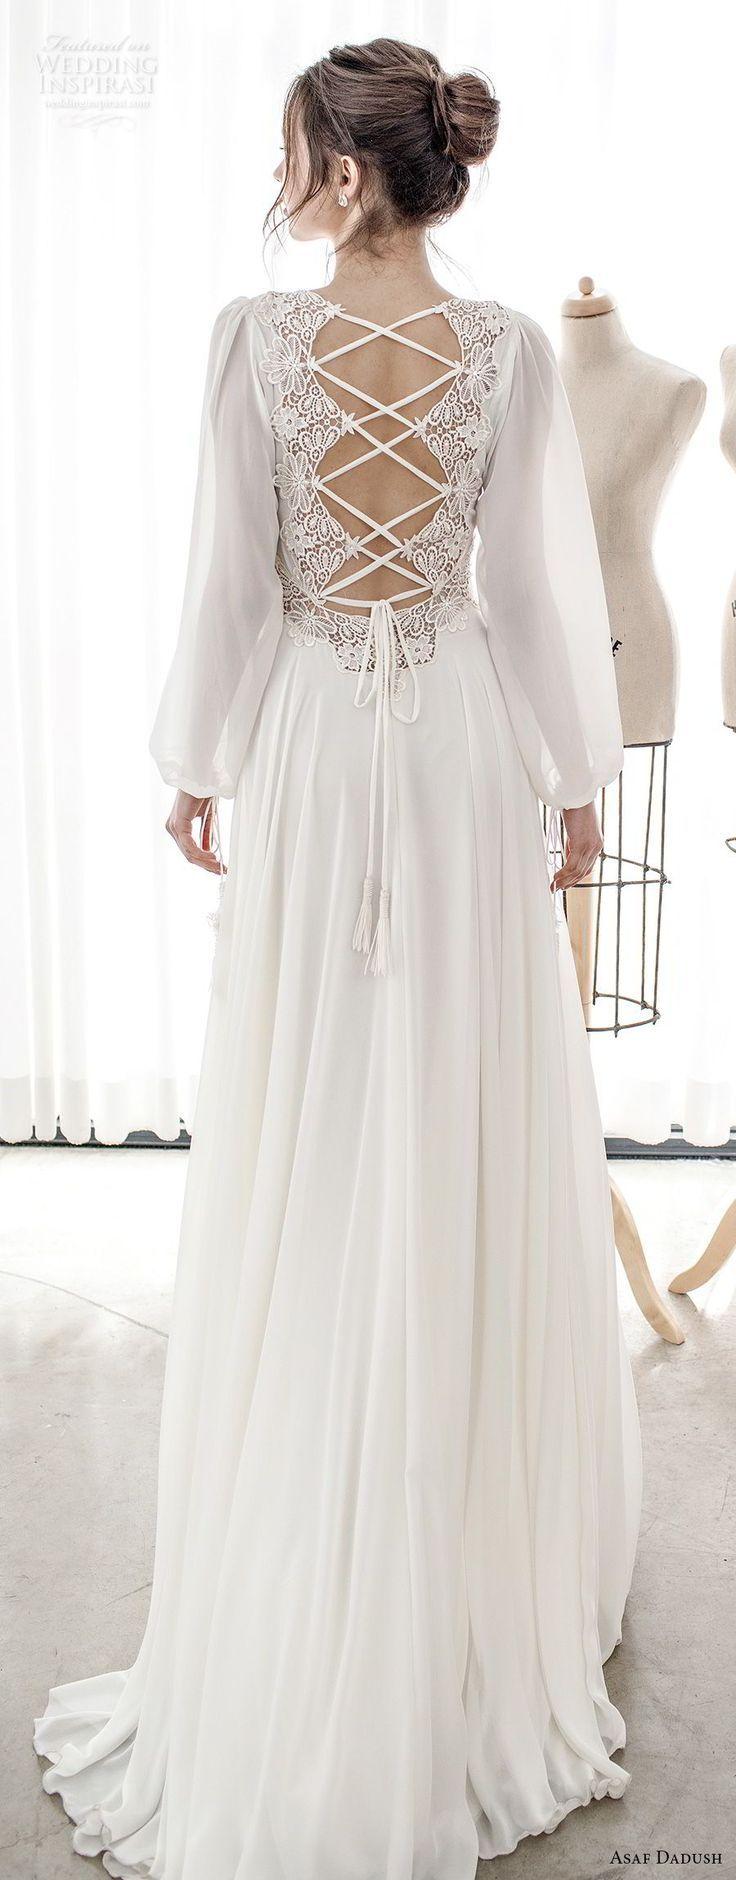 Asaf Dadush 2017 Wedding Dresses   Wedding Inspirasi